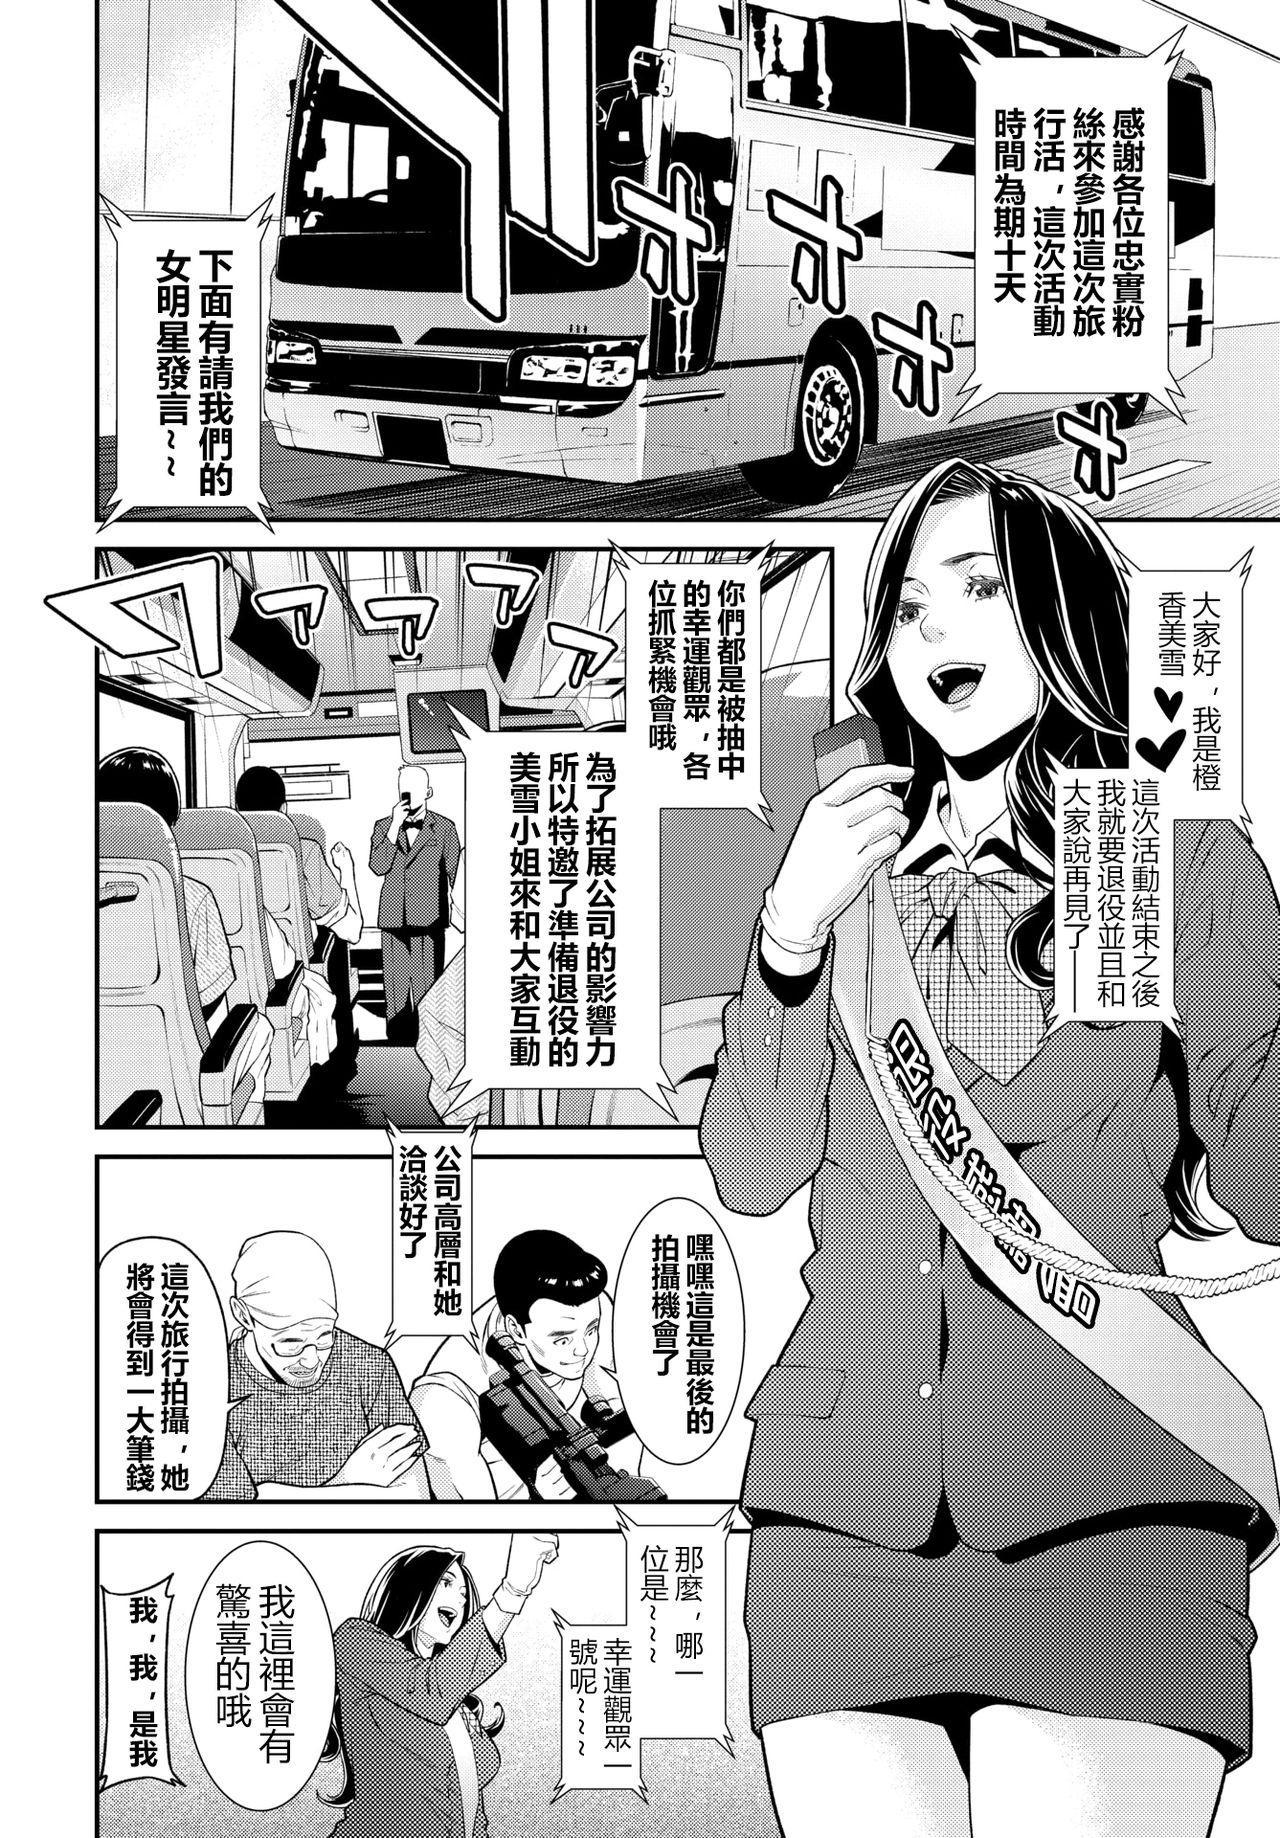 [Syuuen] Secret Wife  1-6 [Chinese][鼠灣漢化](210206最新修复完整版)【極品人妻NTR】 94